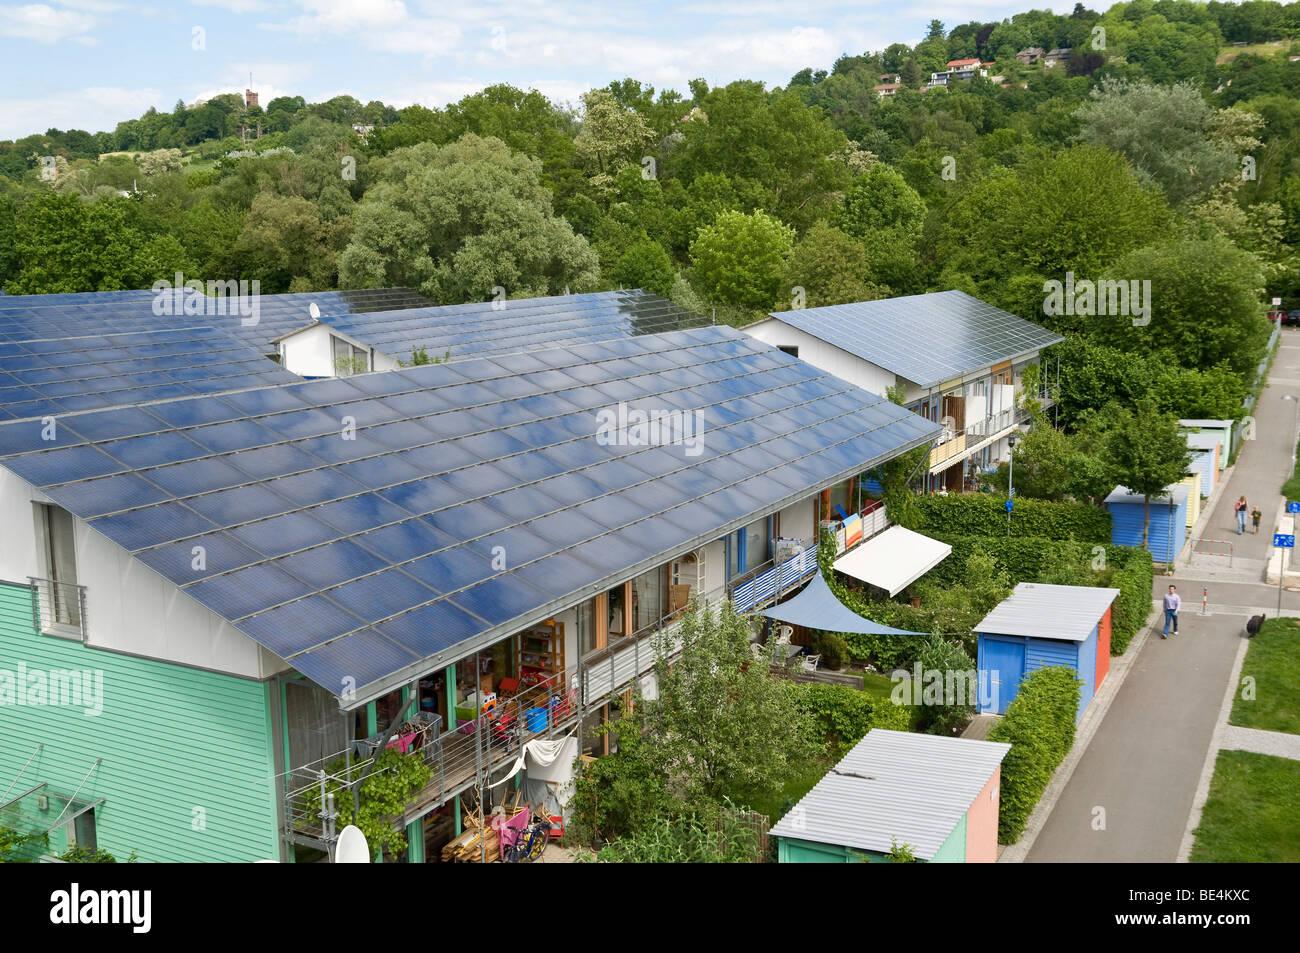 Solar roofs, Vauban, Freiburg, Baden-Wuerttemberg, Germany, Europe - Stock Image